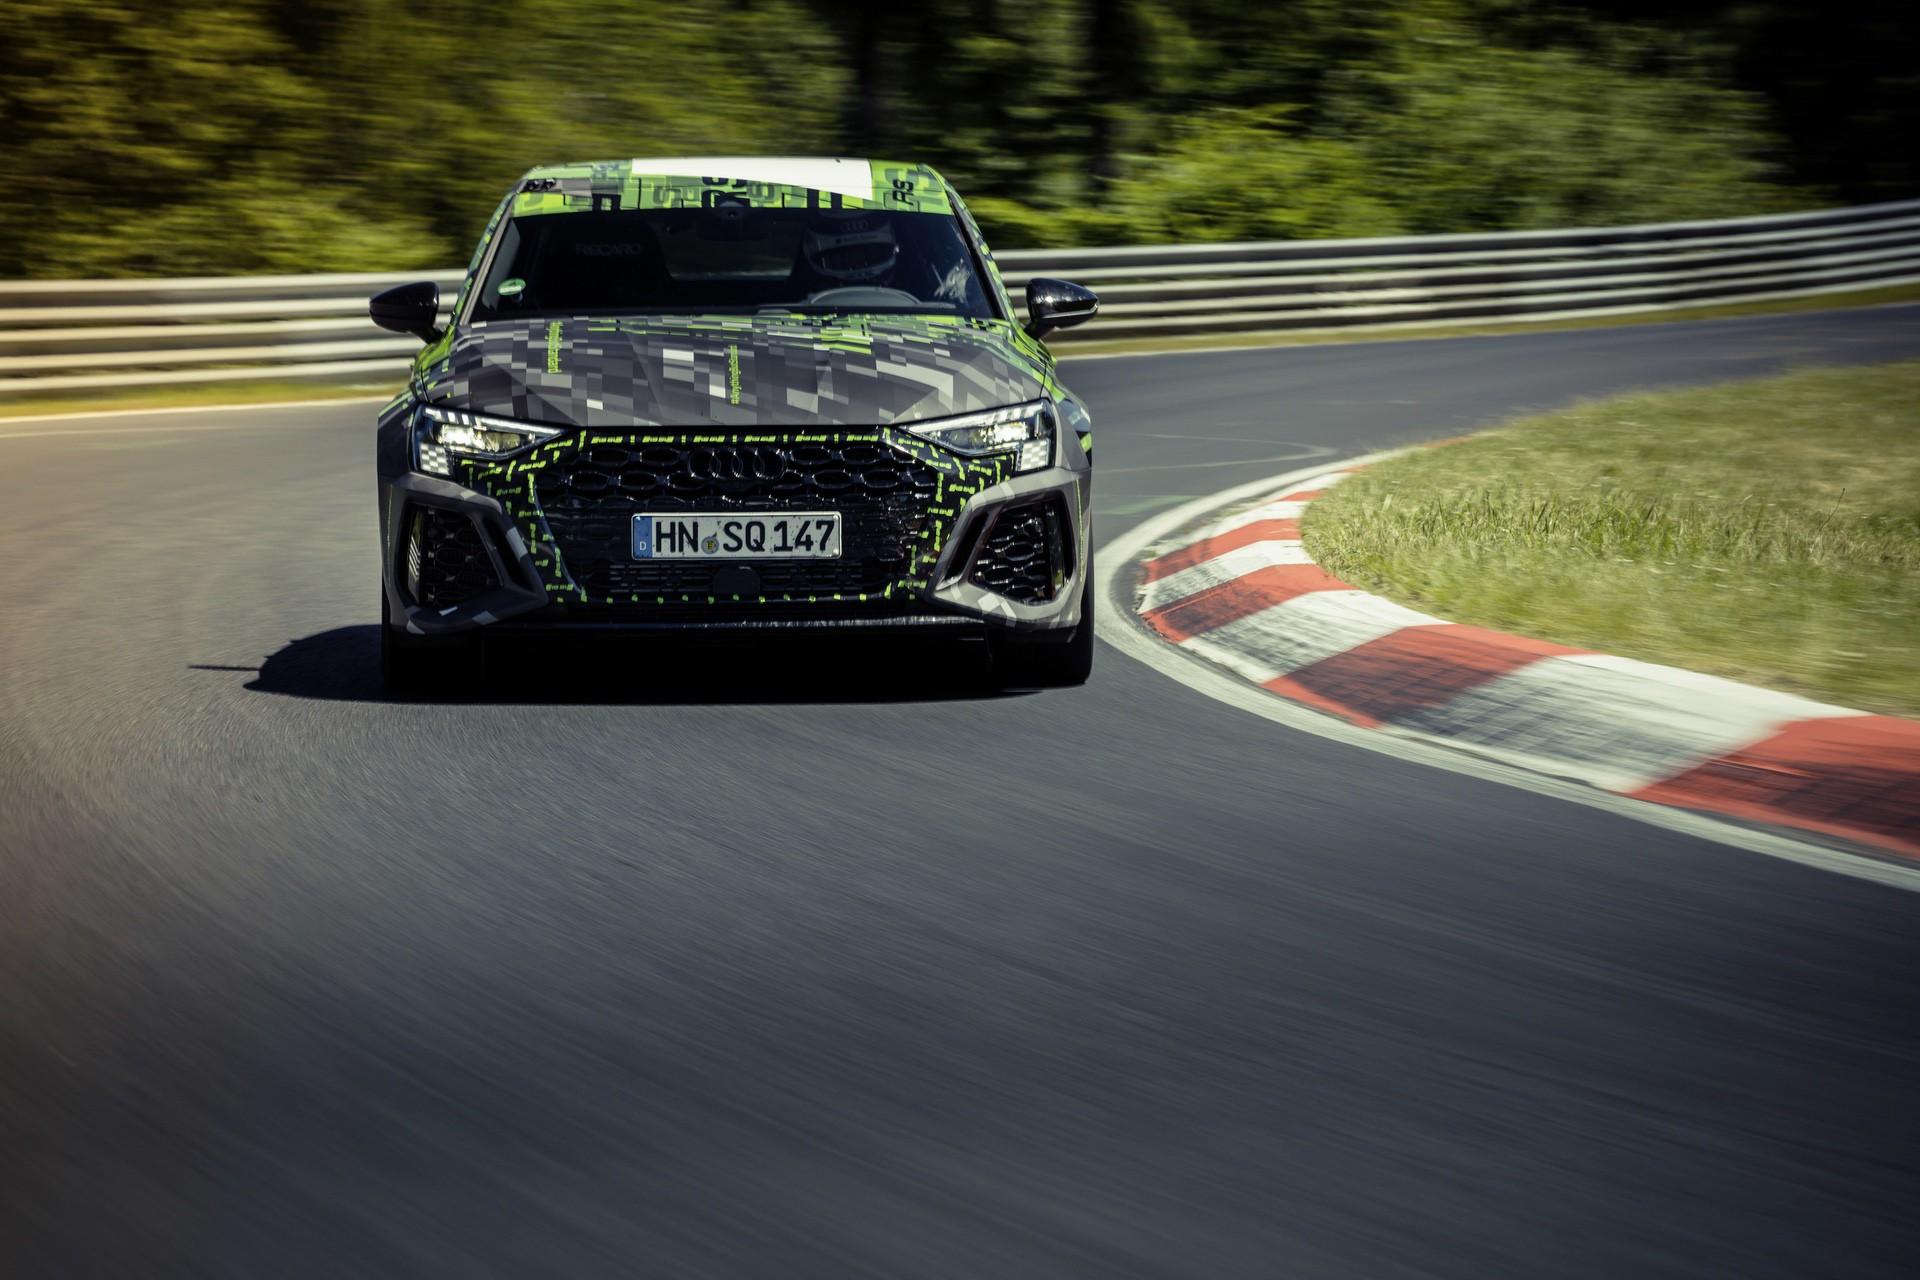 Audi_RS3_Sedan_Nurburgring_lap_record-0006